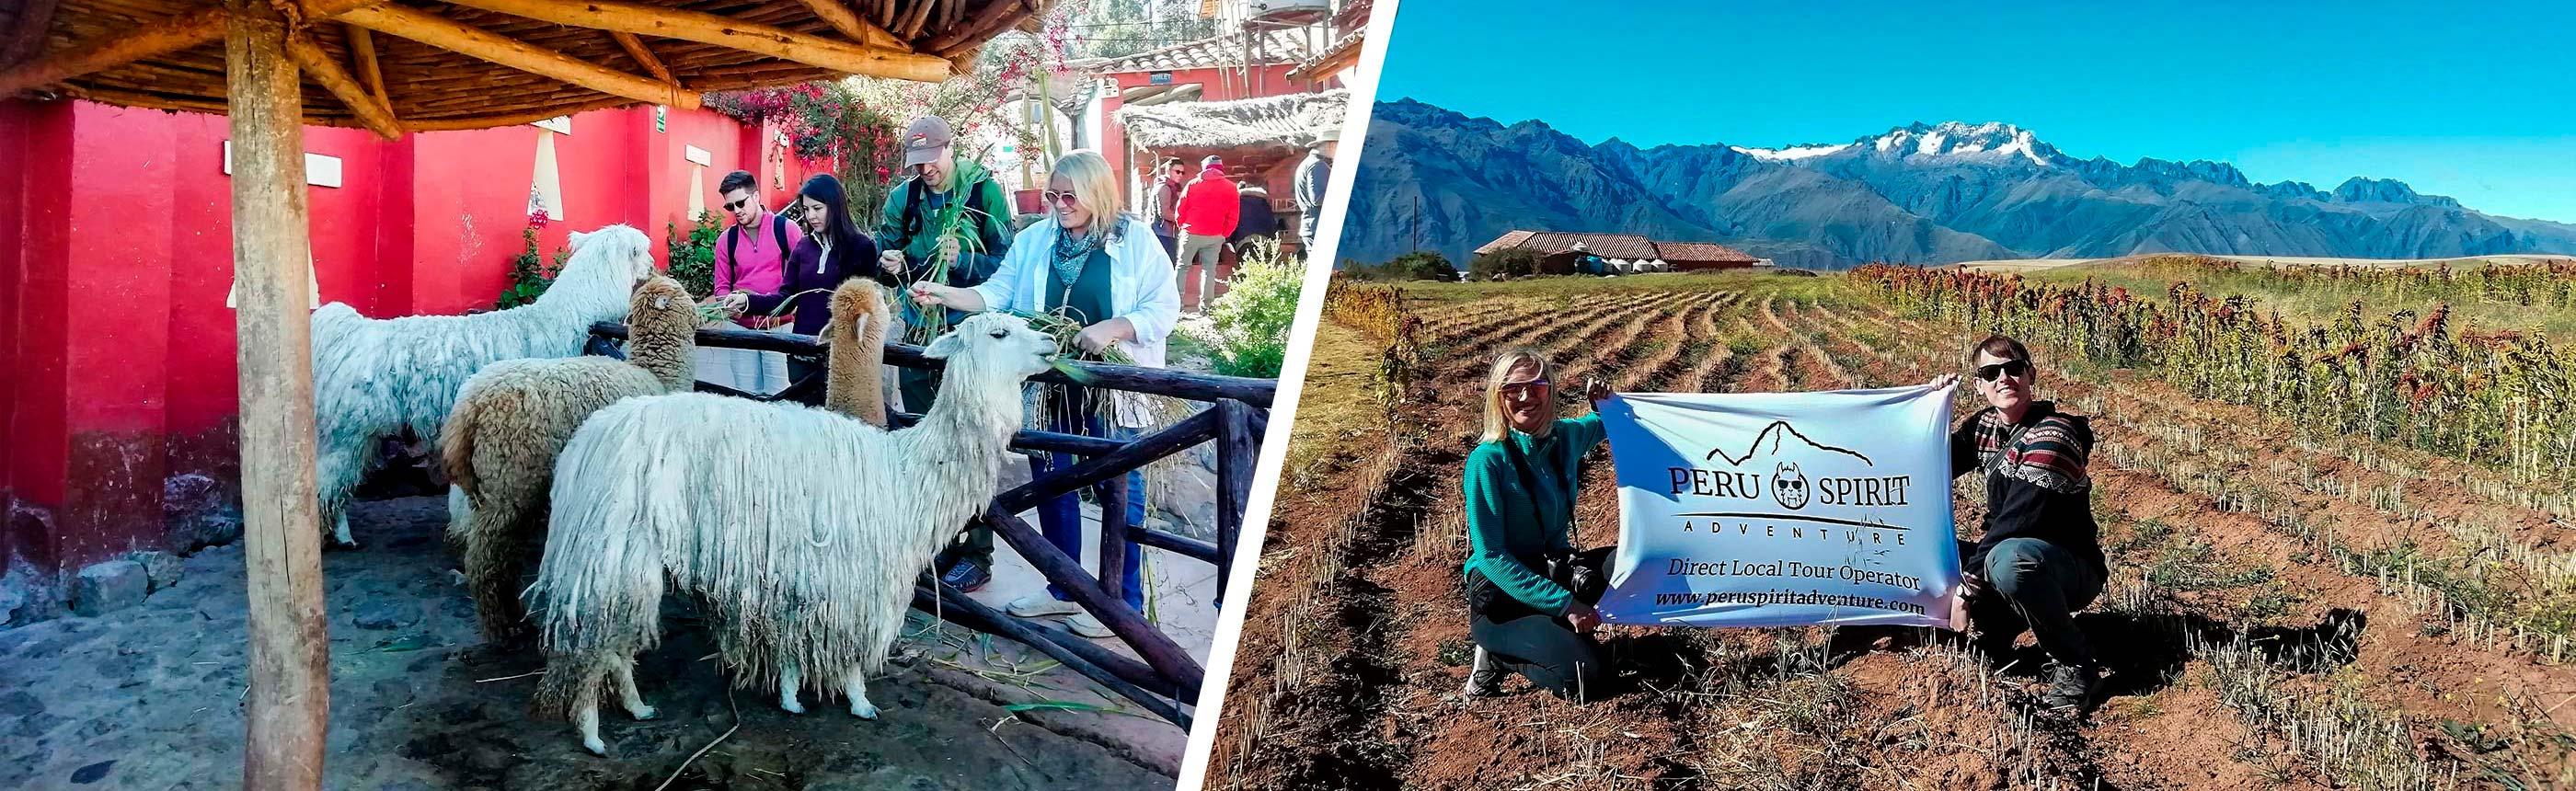 Sacred-Valley-Pisac-and-ollantaytambo-Tou